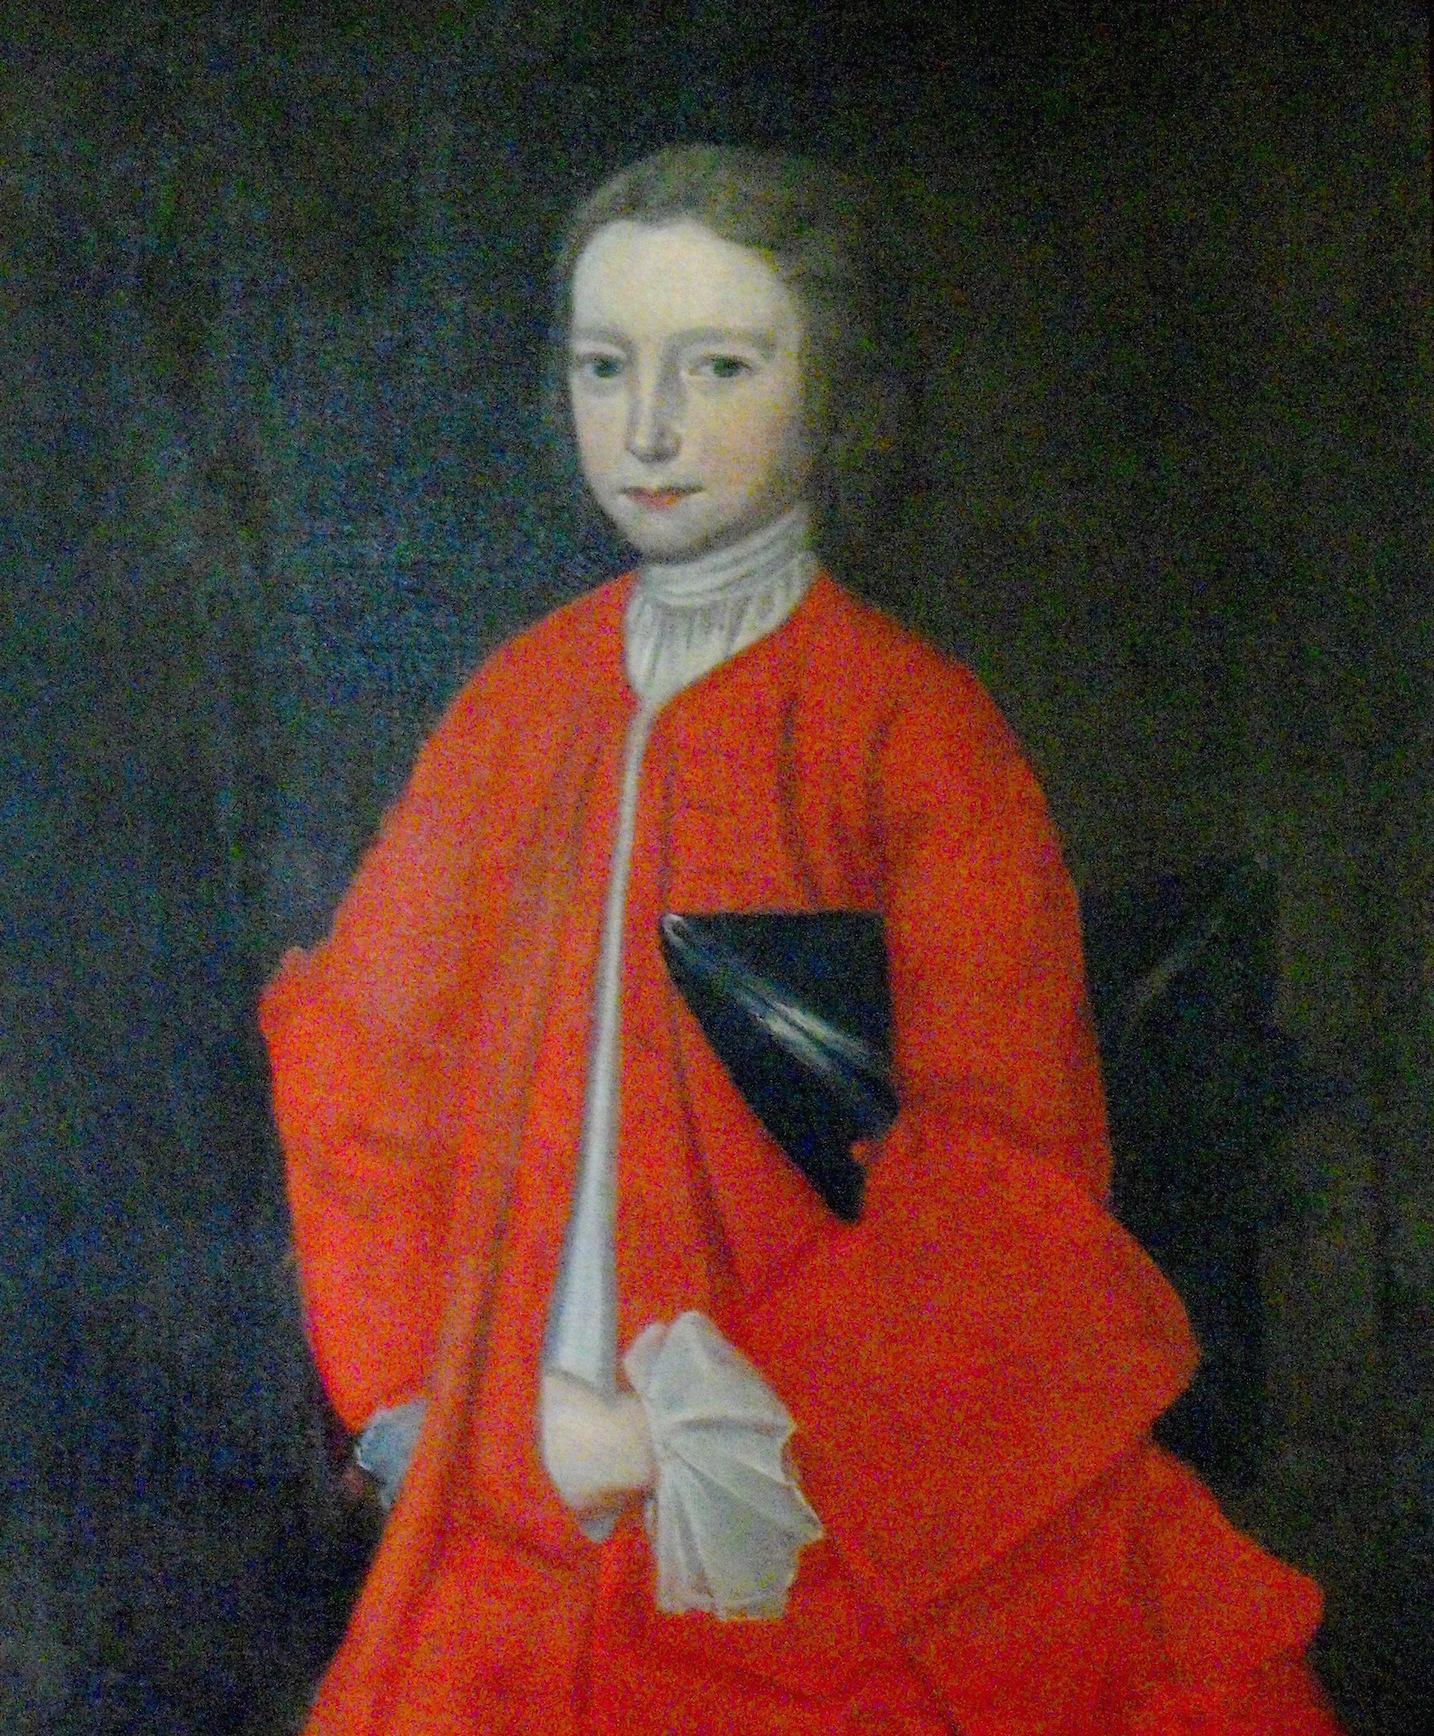 Philip Ludwell III, orthodox, convert, eastern orthodox, green spring